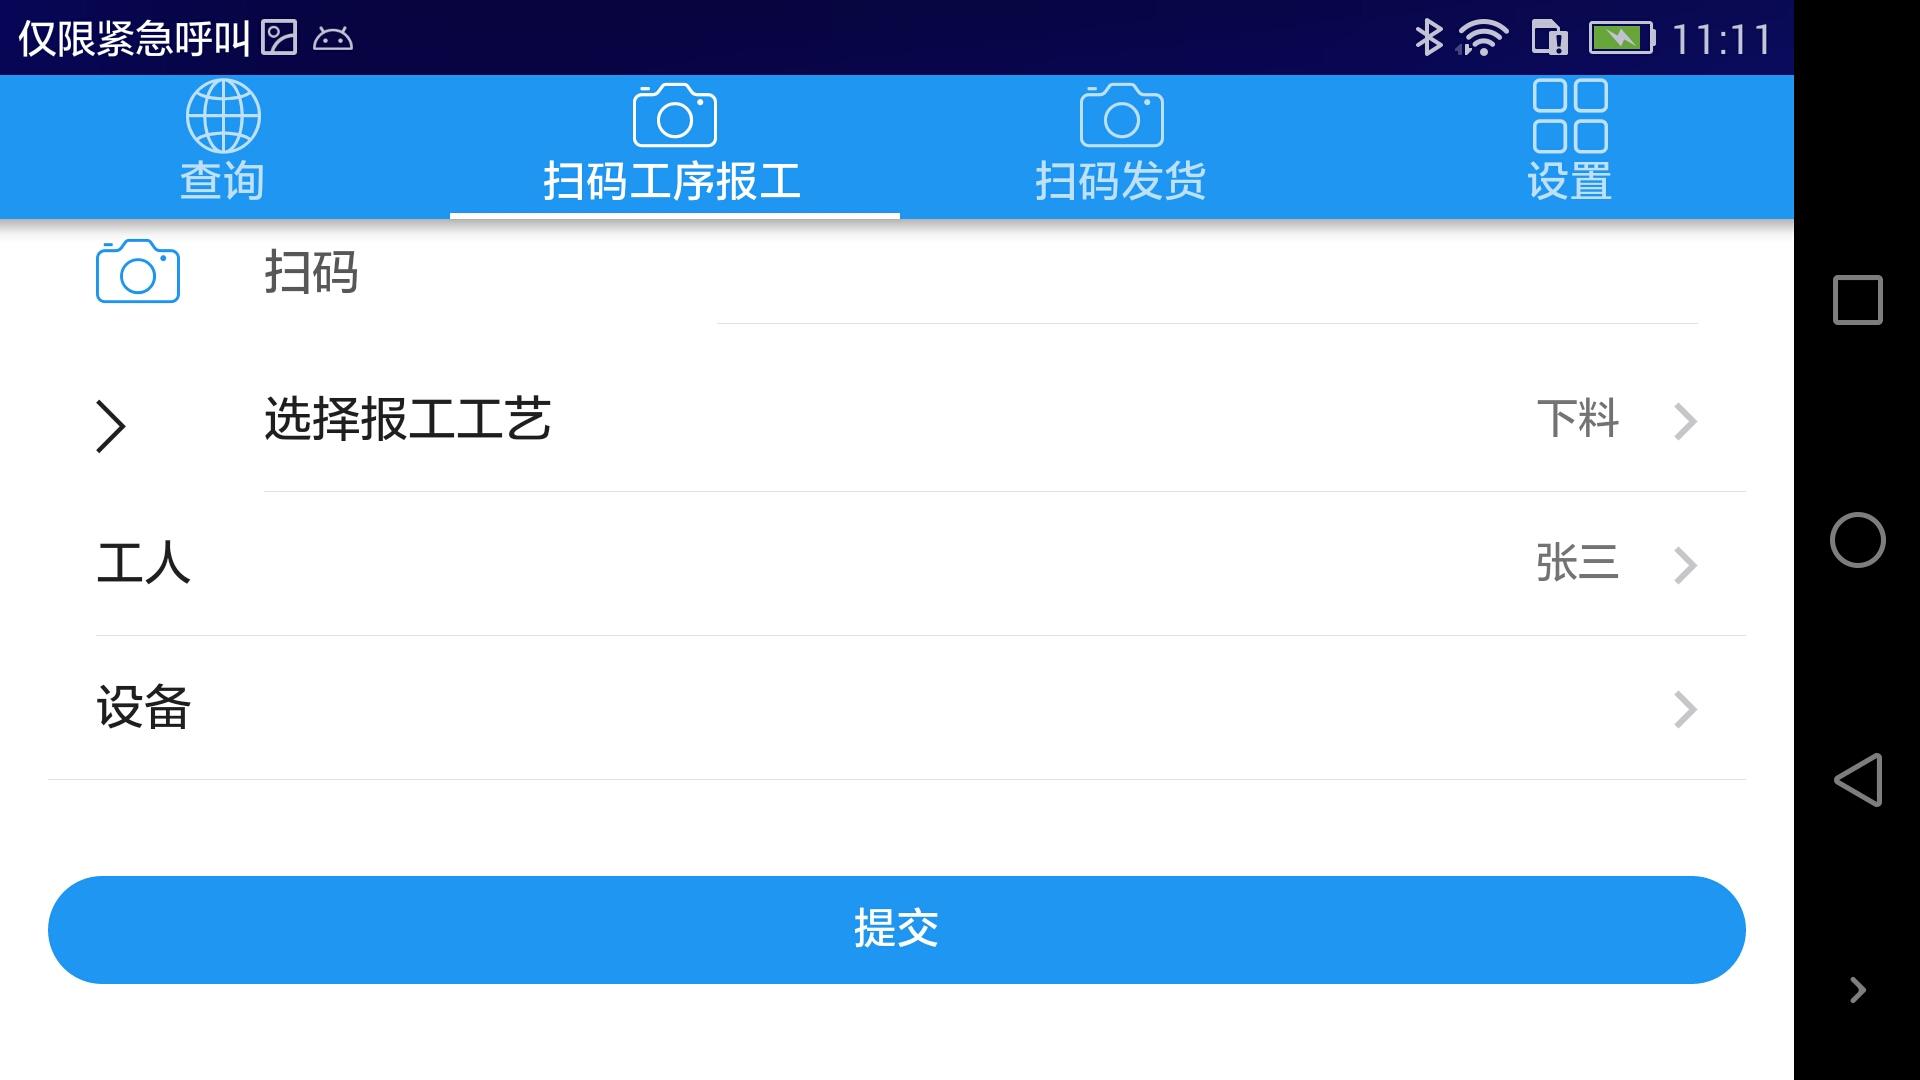 Screenshot 2018 08 30 11 11 30 - 速易天工V3 生产进度管理软件